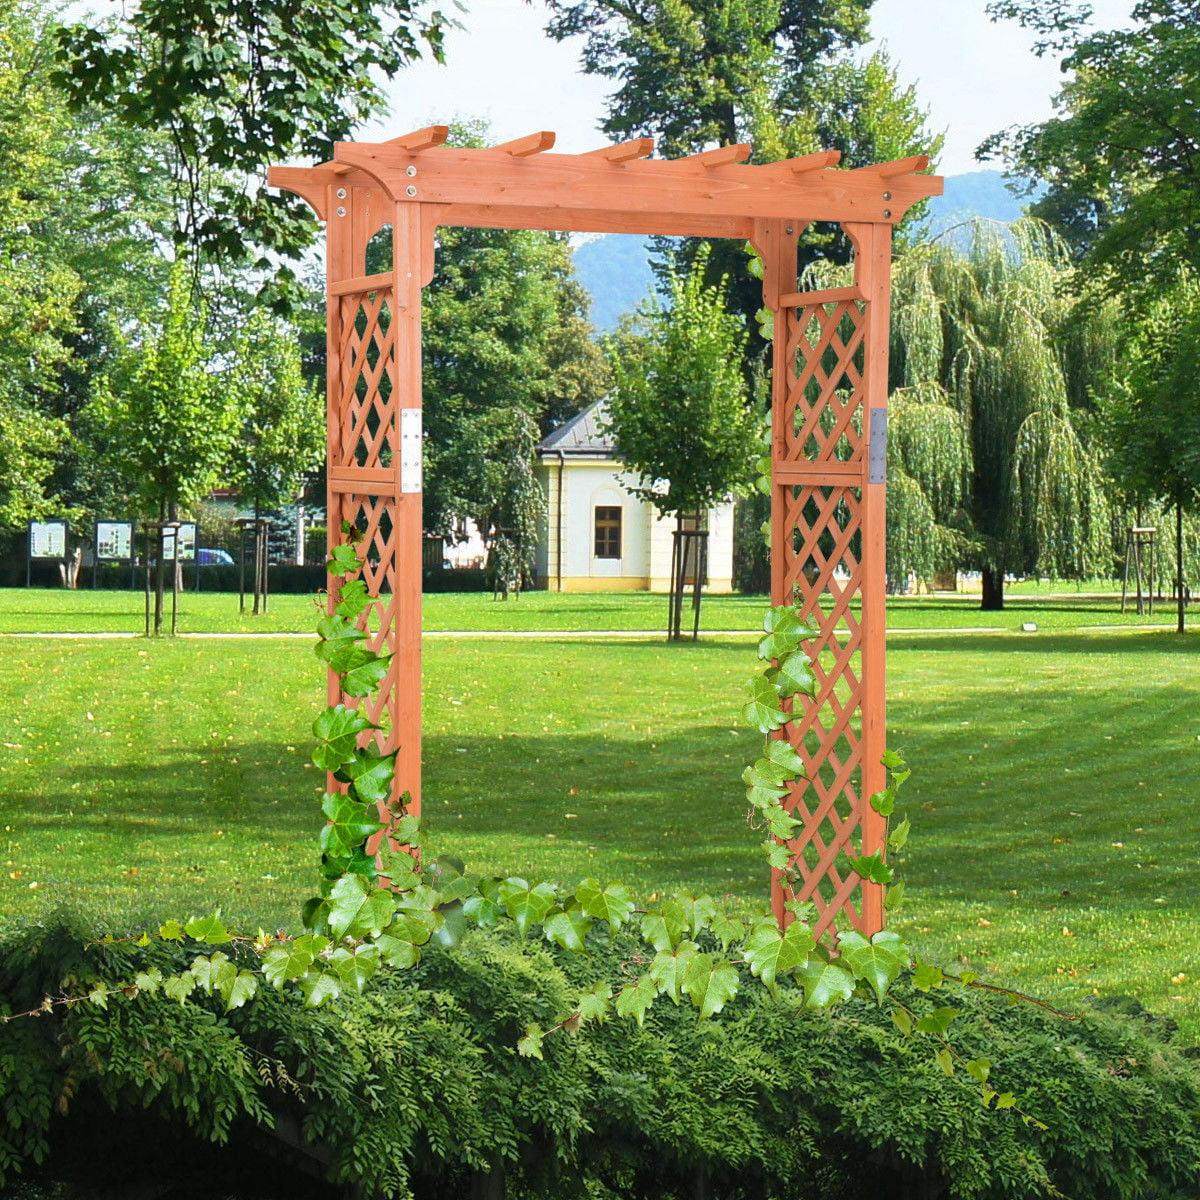 Costway Arbor Over 7FT High Wooden Garden Arch Trellis Pergola Outdoor Patio Plant by Costway